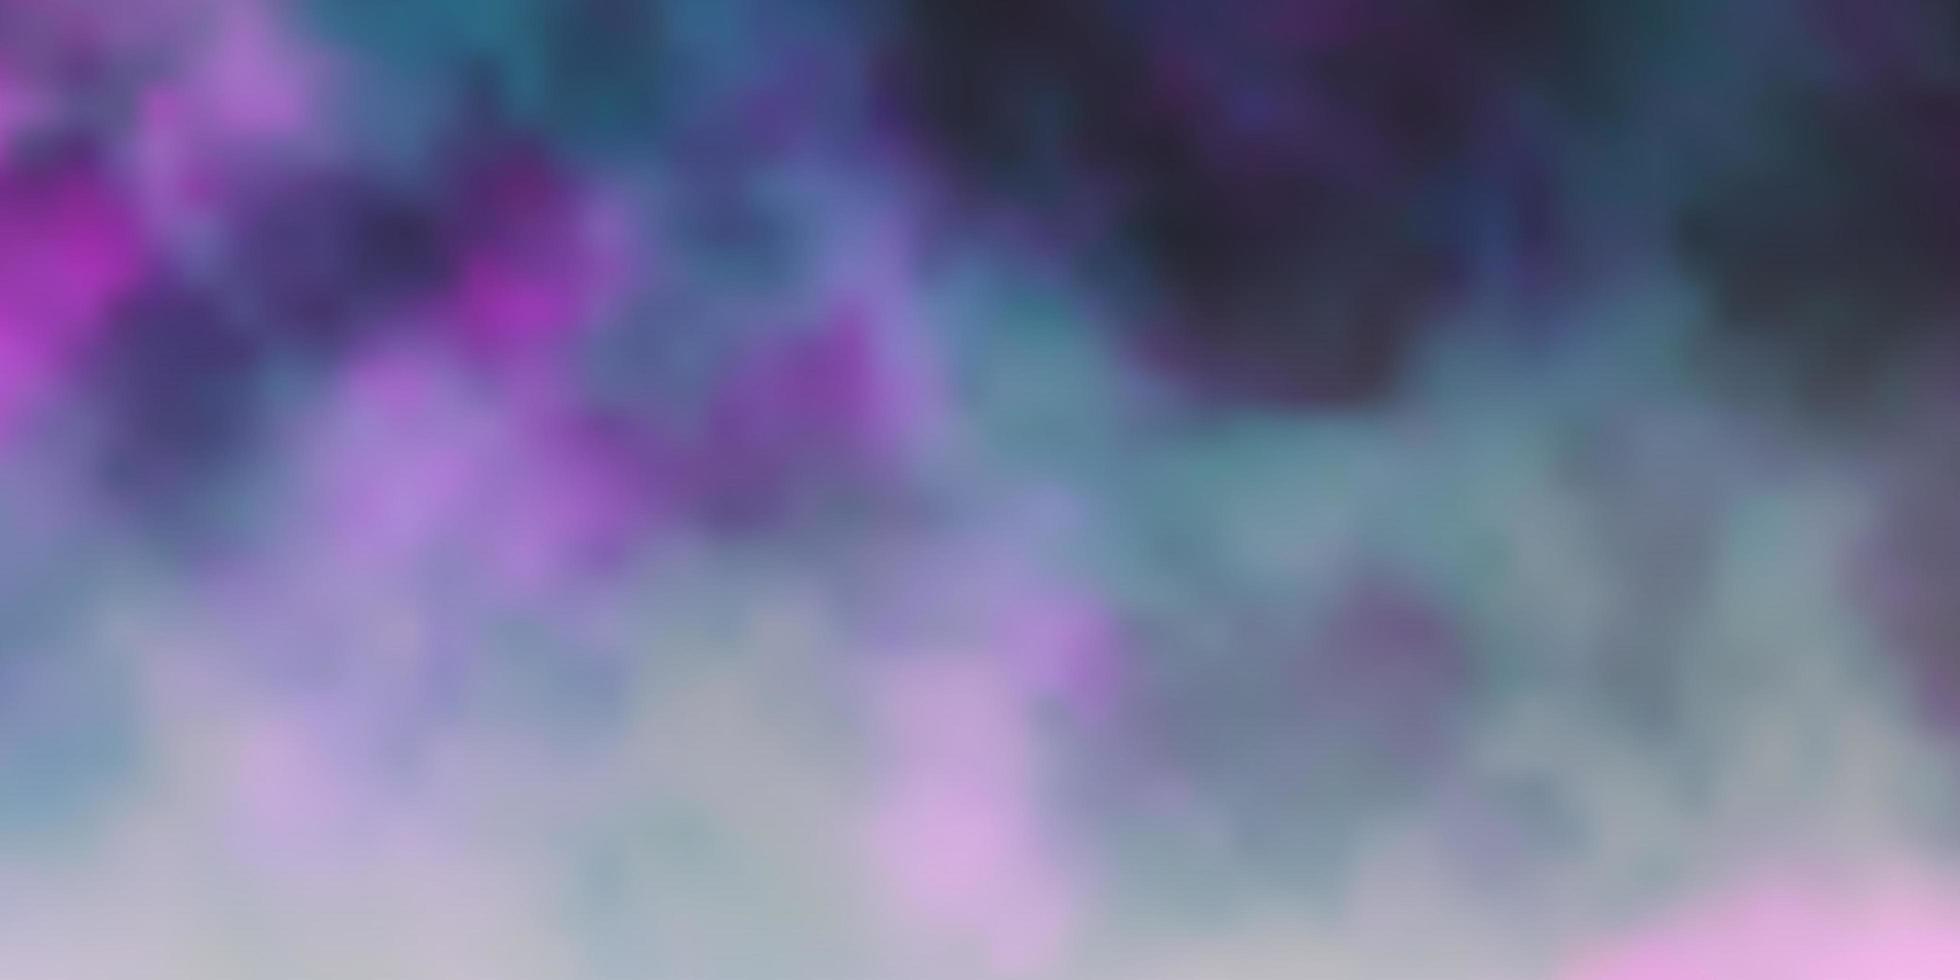 dunkelviolette, rosa Vektorschablone mit Himmel, Wolken. vektor